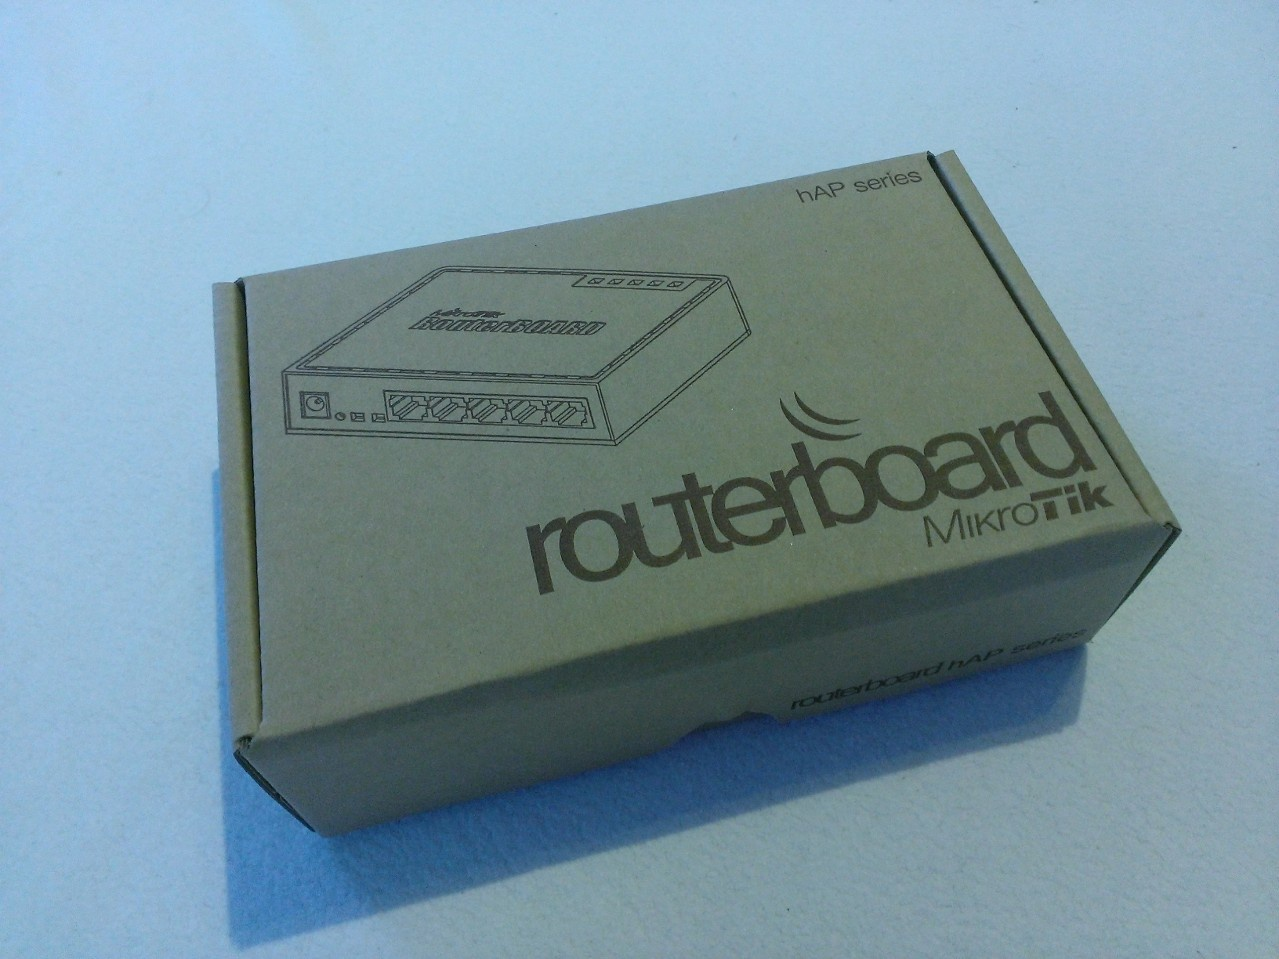 Mikrotik Routerboard Rb941 2nd Hap Lite Rohaantje Userreviews Tc Http Static Ext F 70ldcxxnfwqg5uxstlpkqnr5